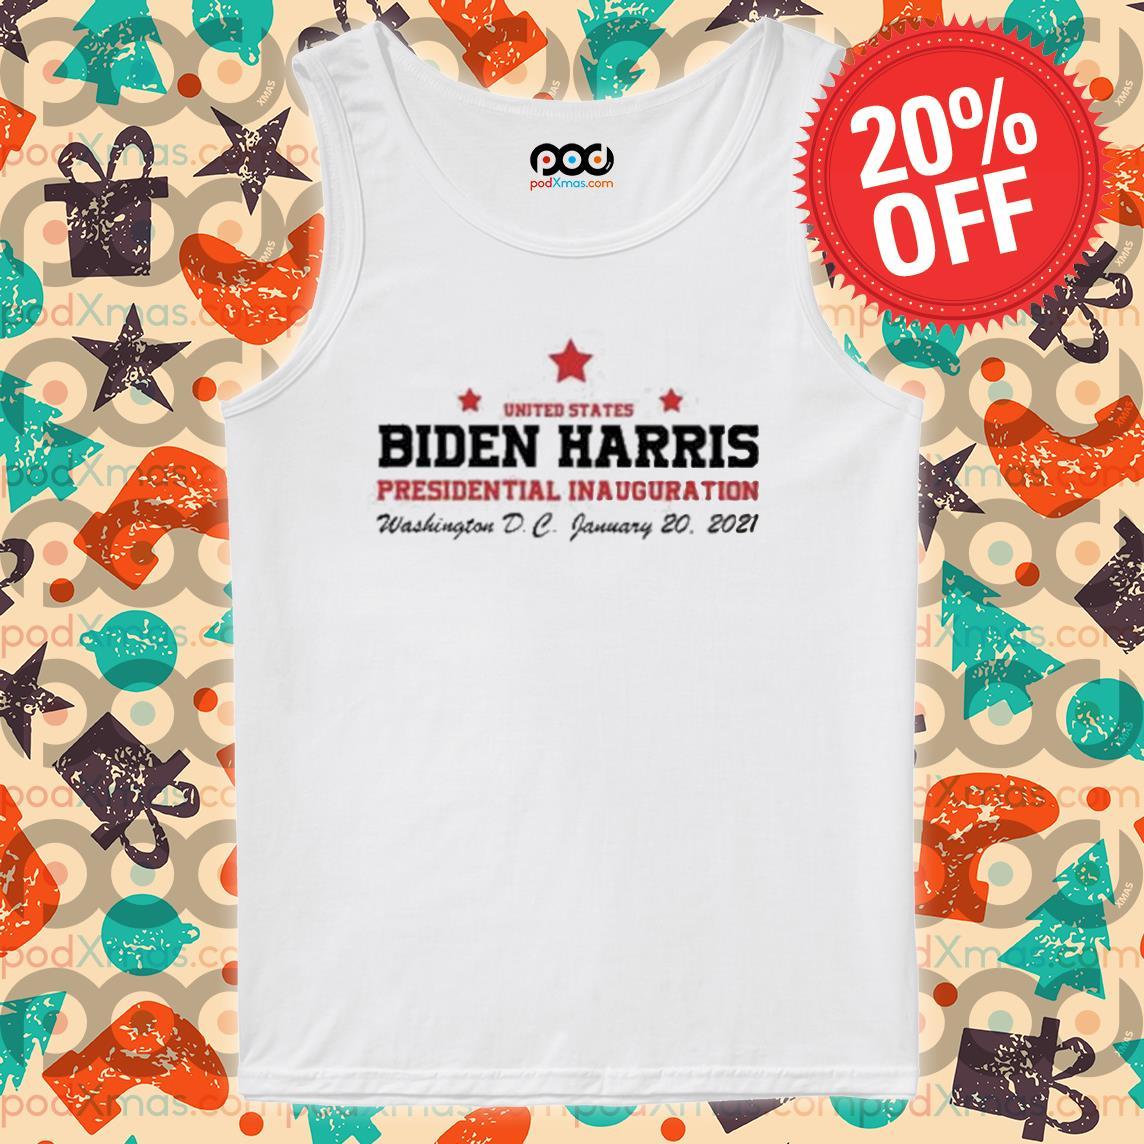 United States Biden Harris Presidential Inauguration Washington D C January 20 2021 s Tank top PODxmas trang